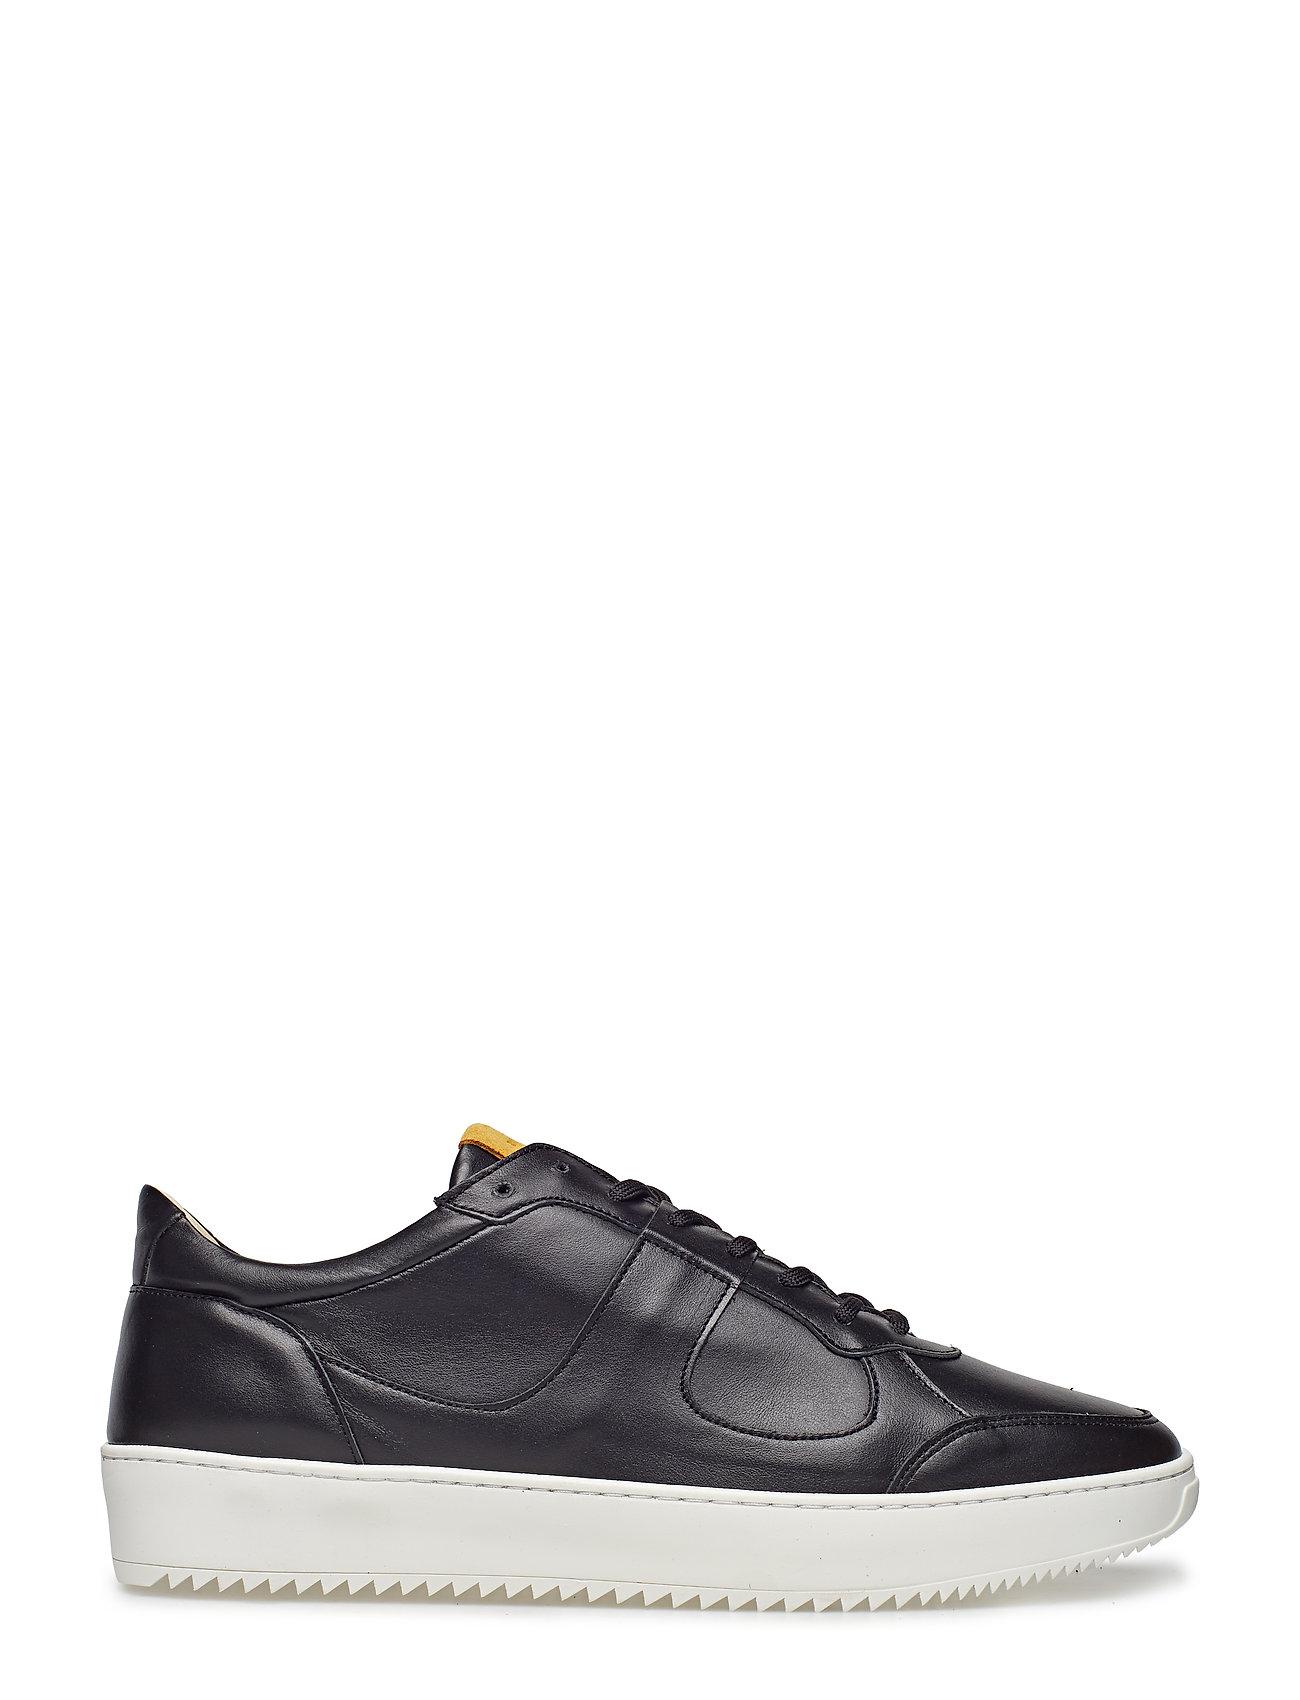 Royal RepubliQ Bolt Oxford Sneakers Herrer Sort Sko Low